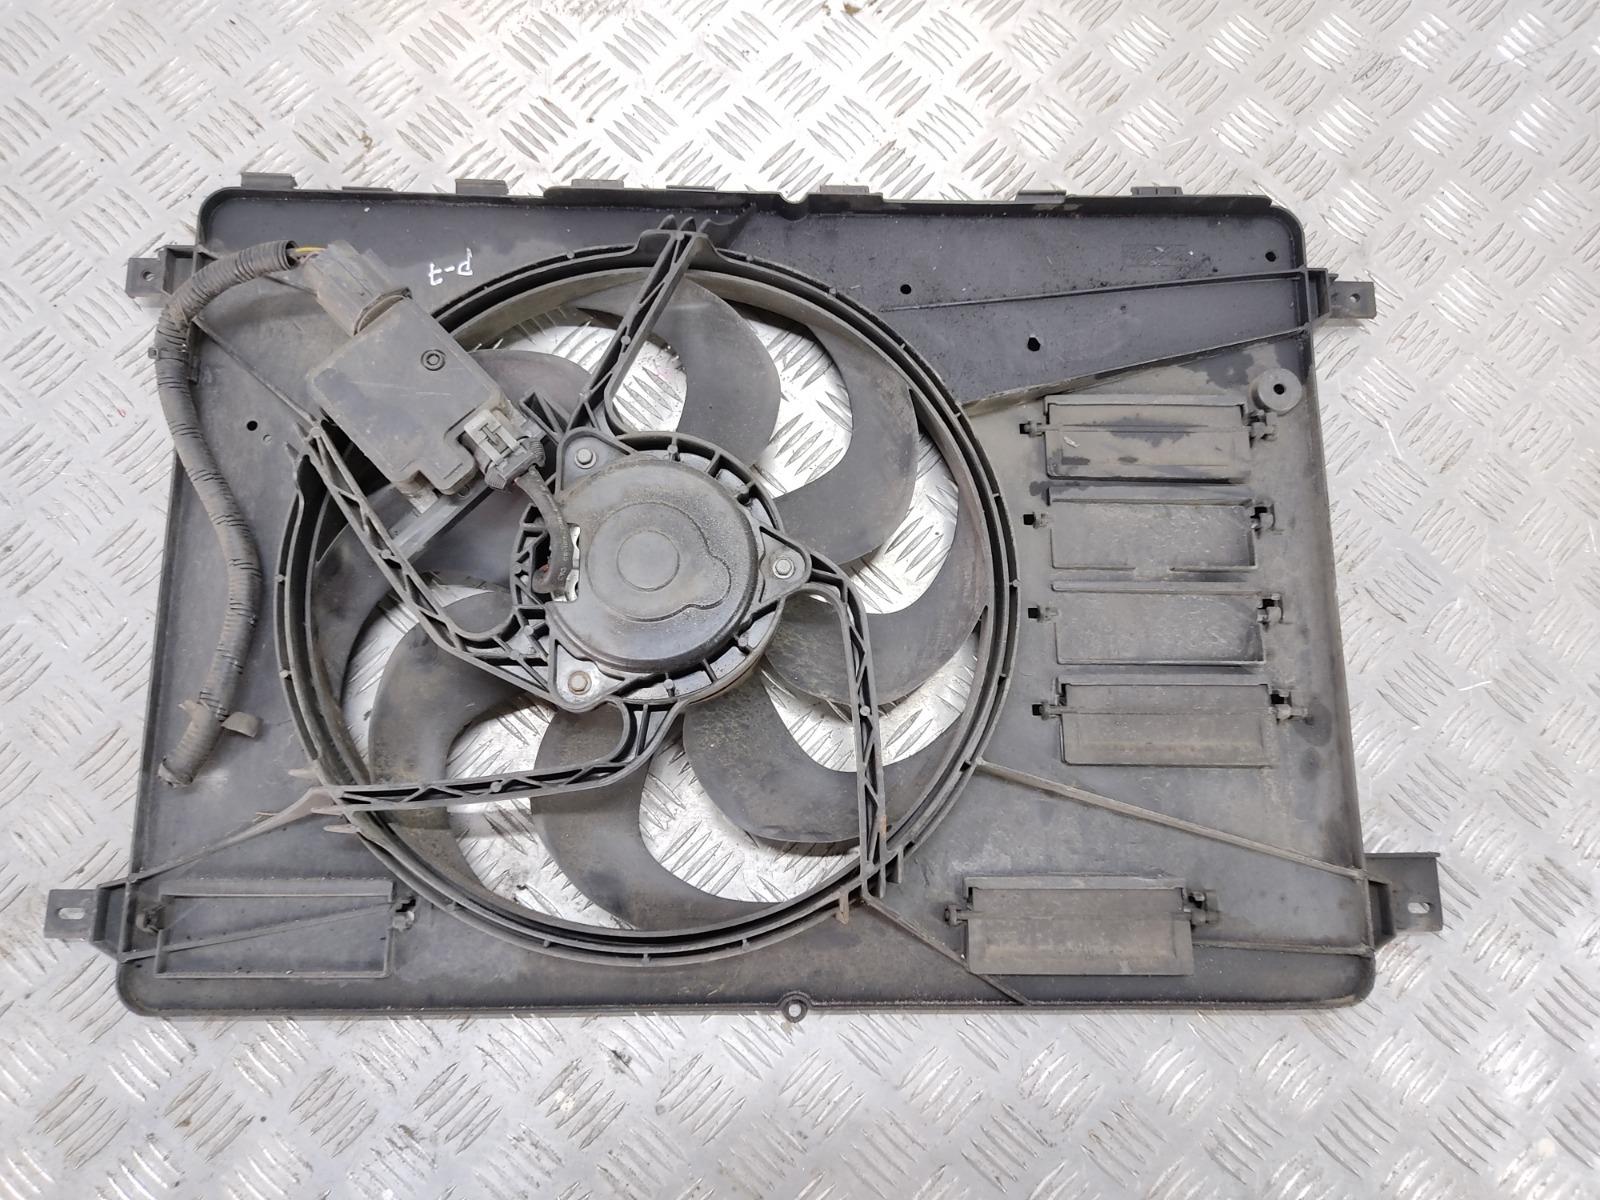 Вентилятор радиатора Ford Mondeo 2.0 TDCI 2010 (б/у)